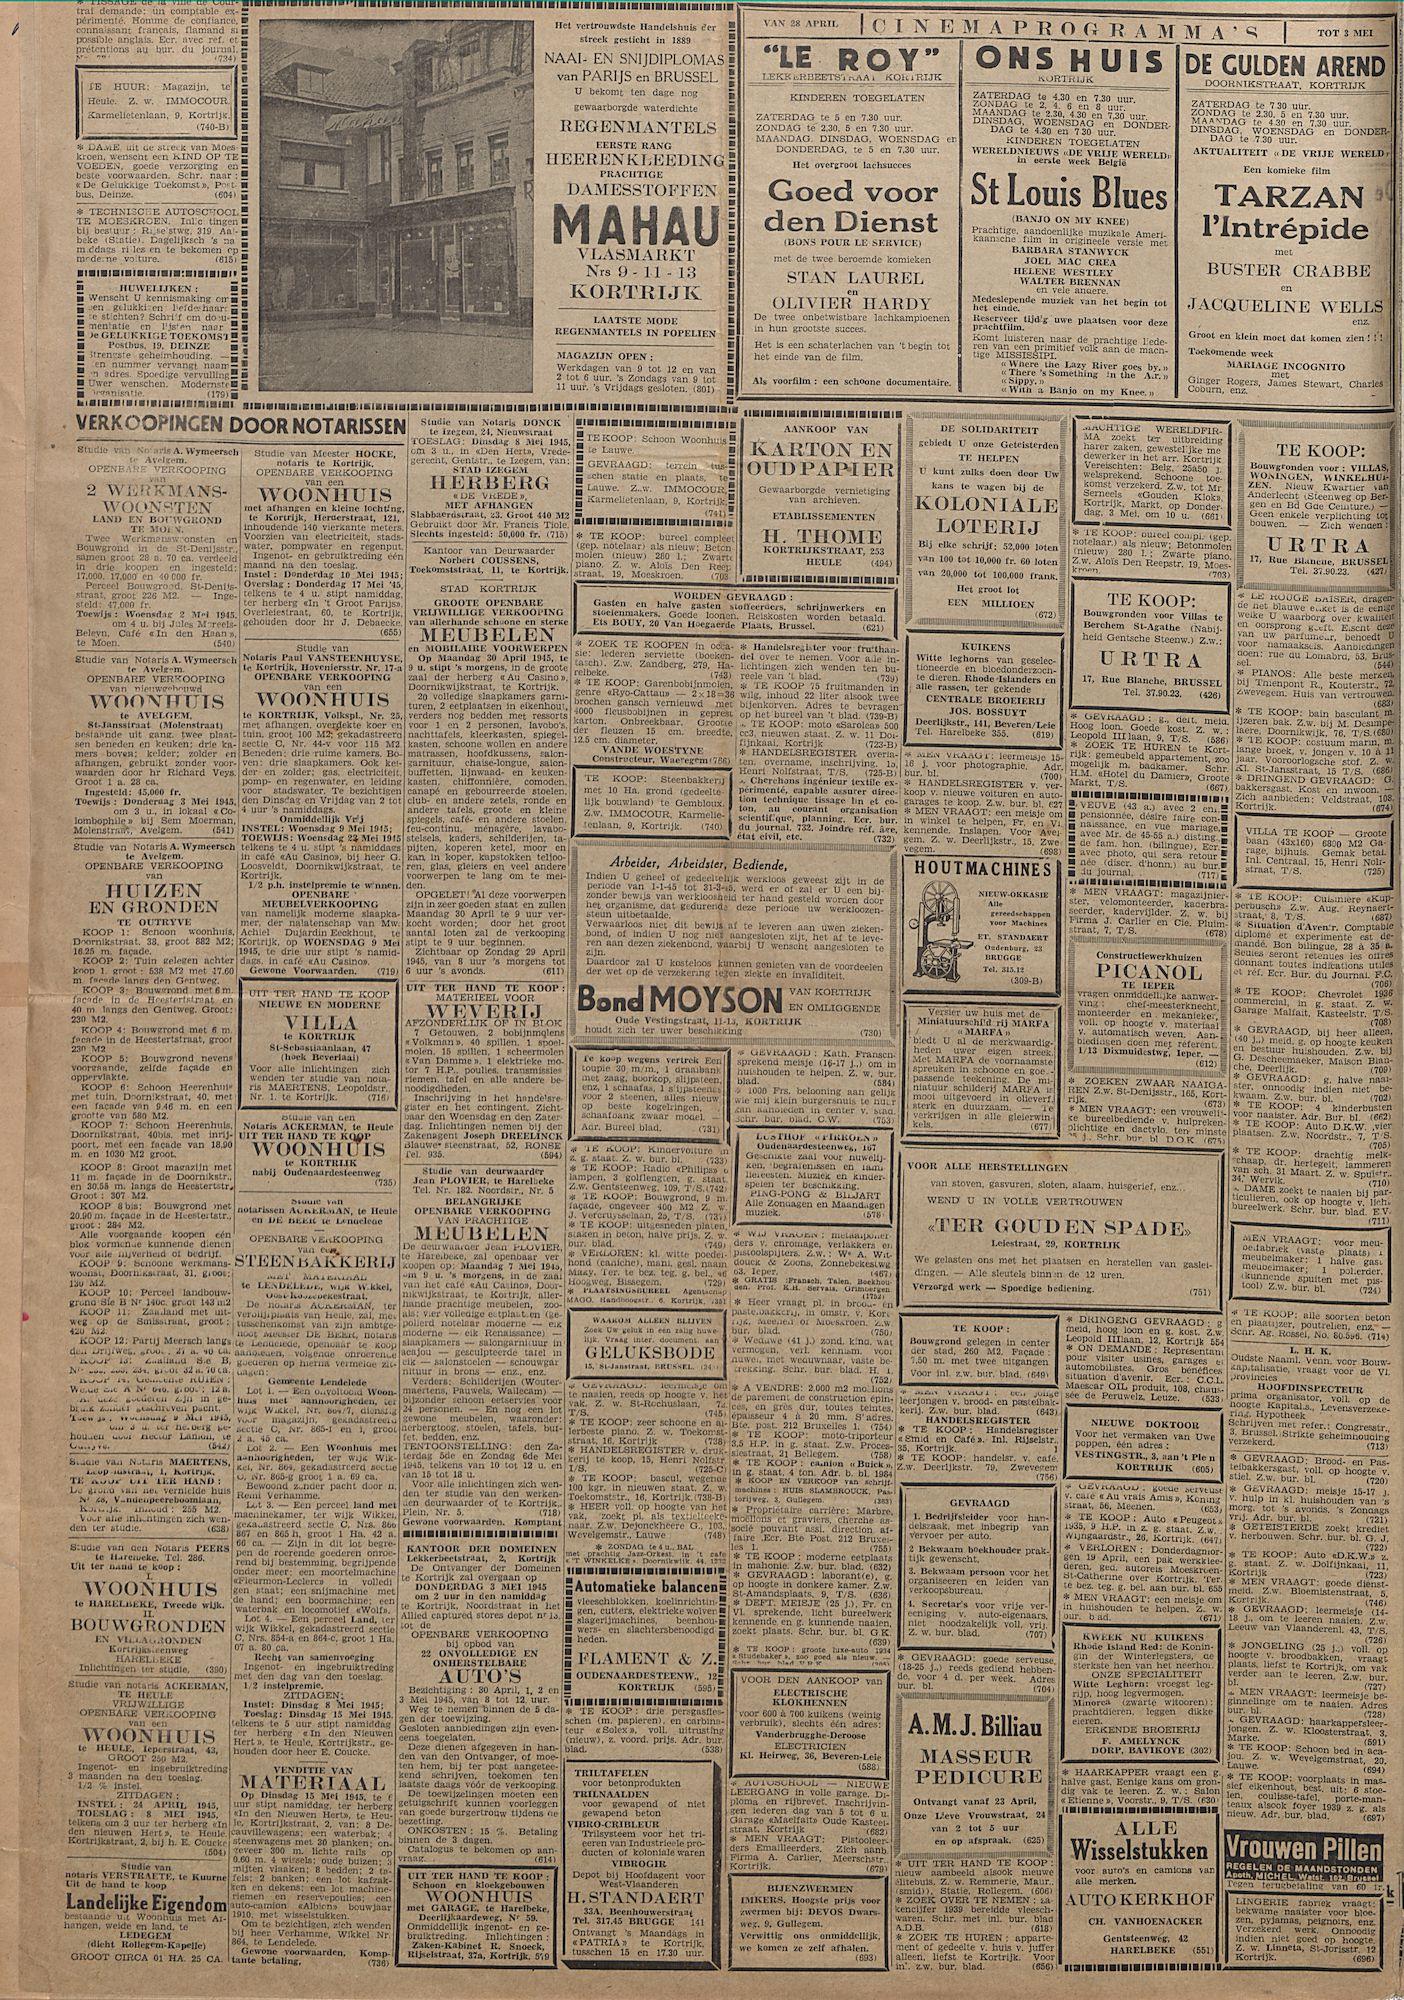 Kortrijksch Handelsblad 28 april 1945 Nr34 p2